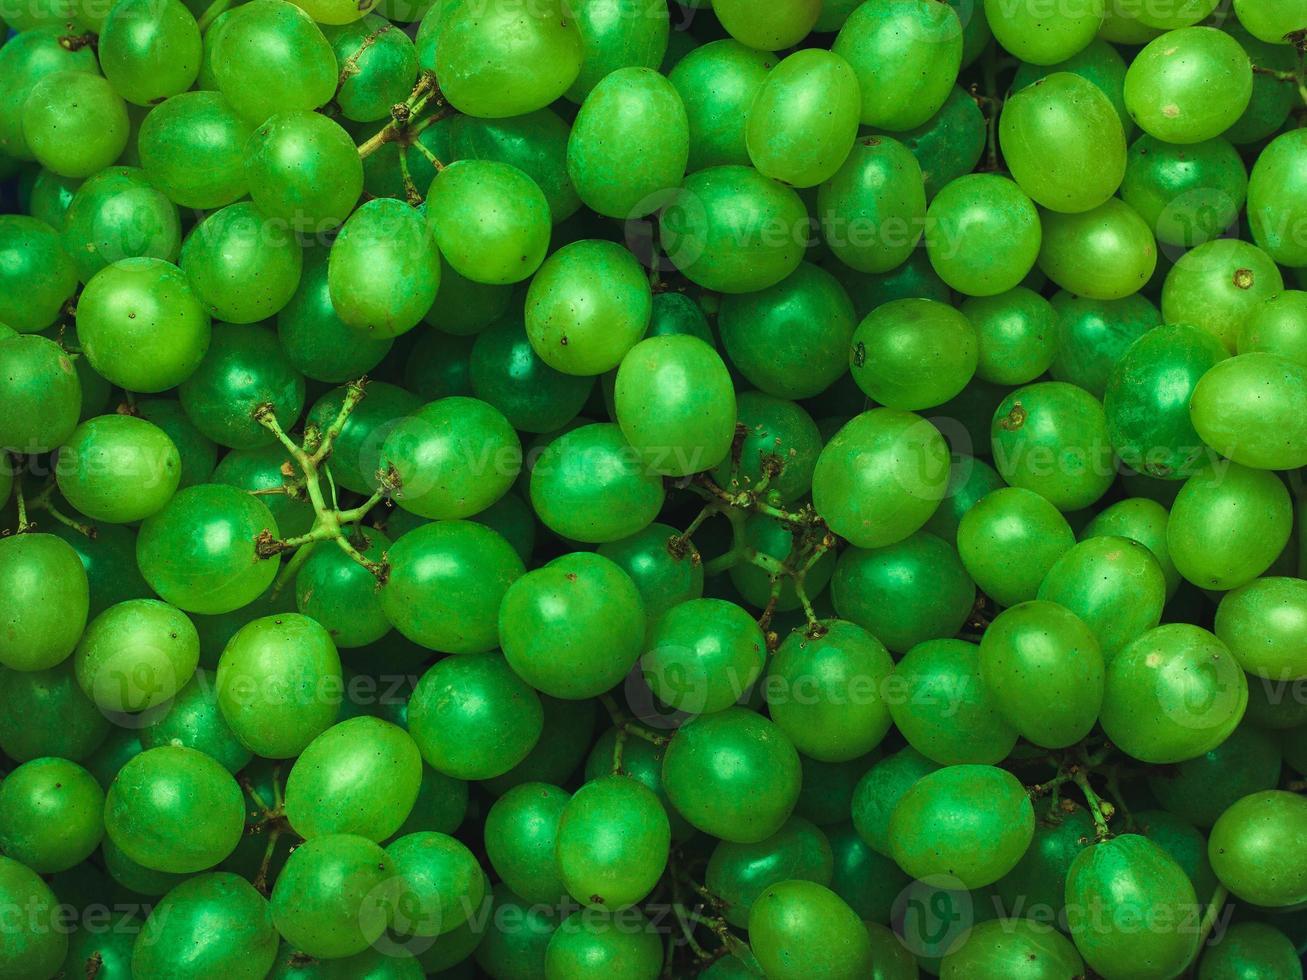 Large green grapes. photo